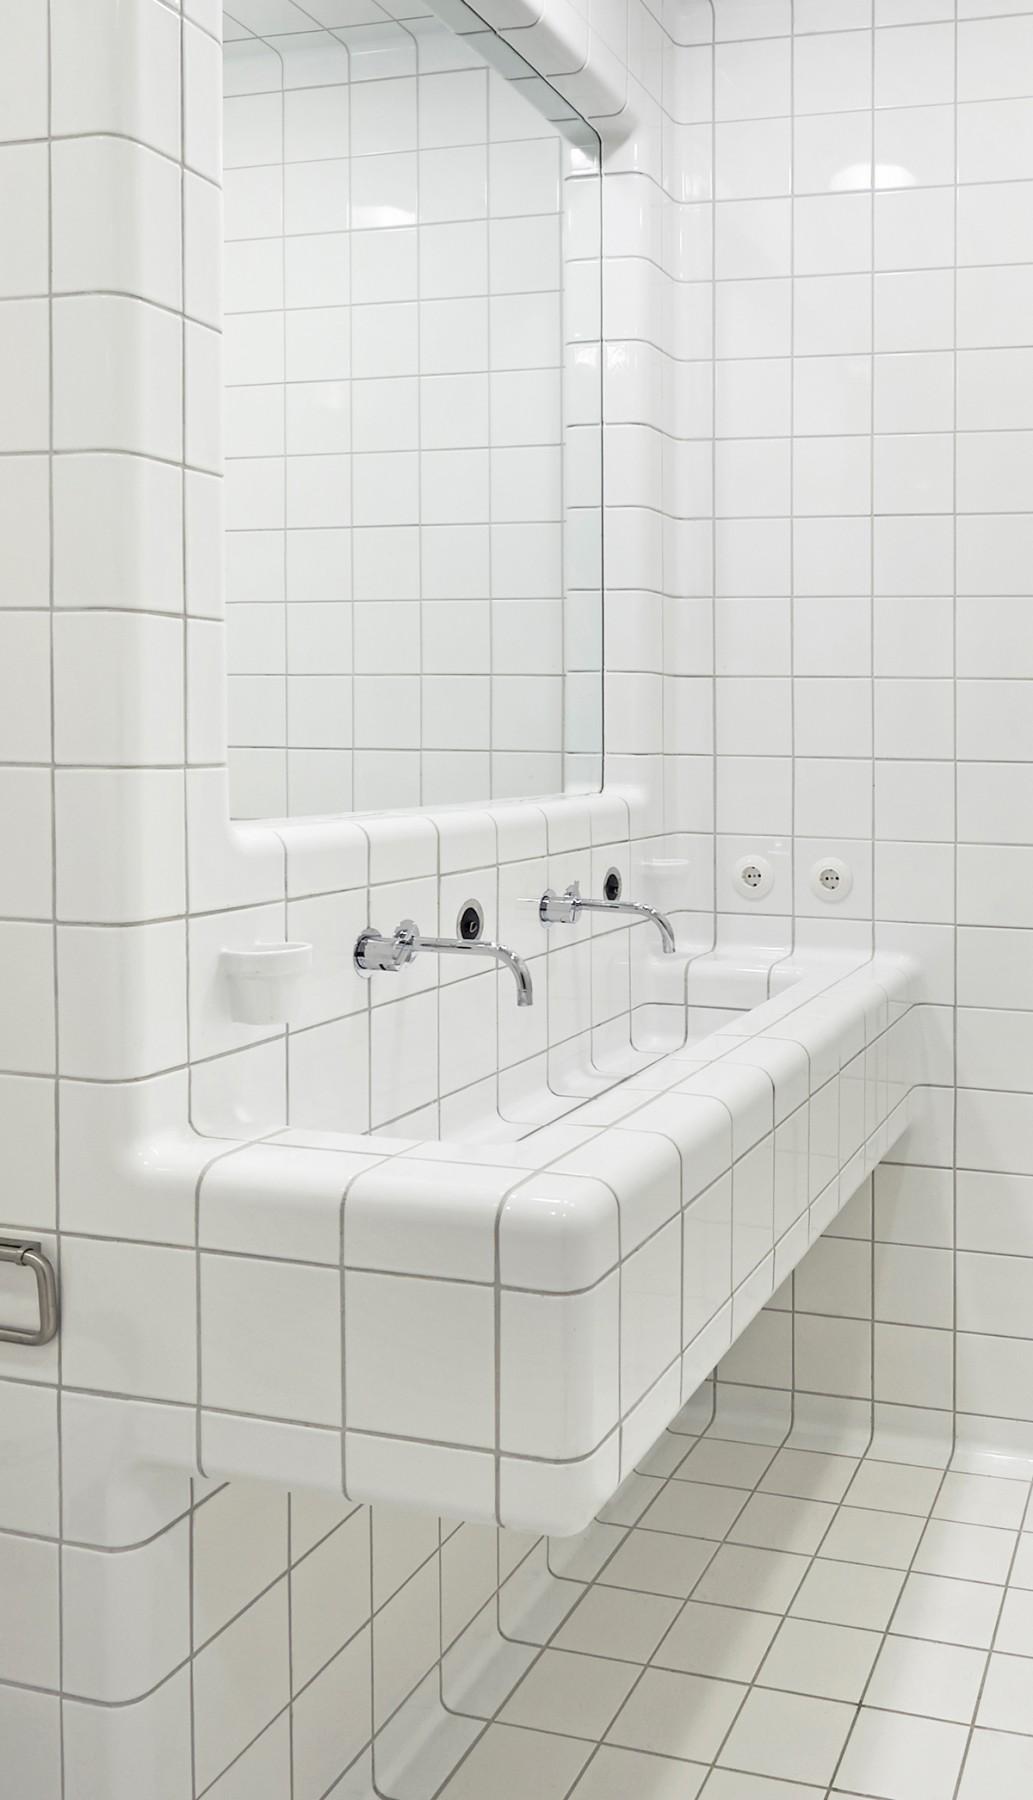 driedimensionale tegels wasbak, moderne constructie en functietegels in diverse kleuren